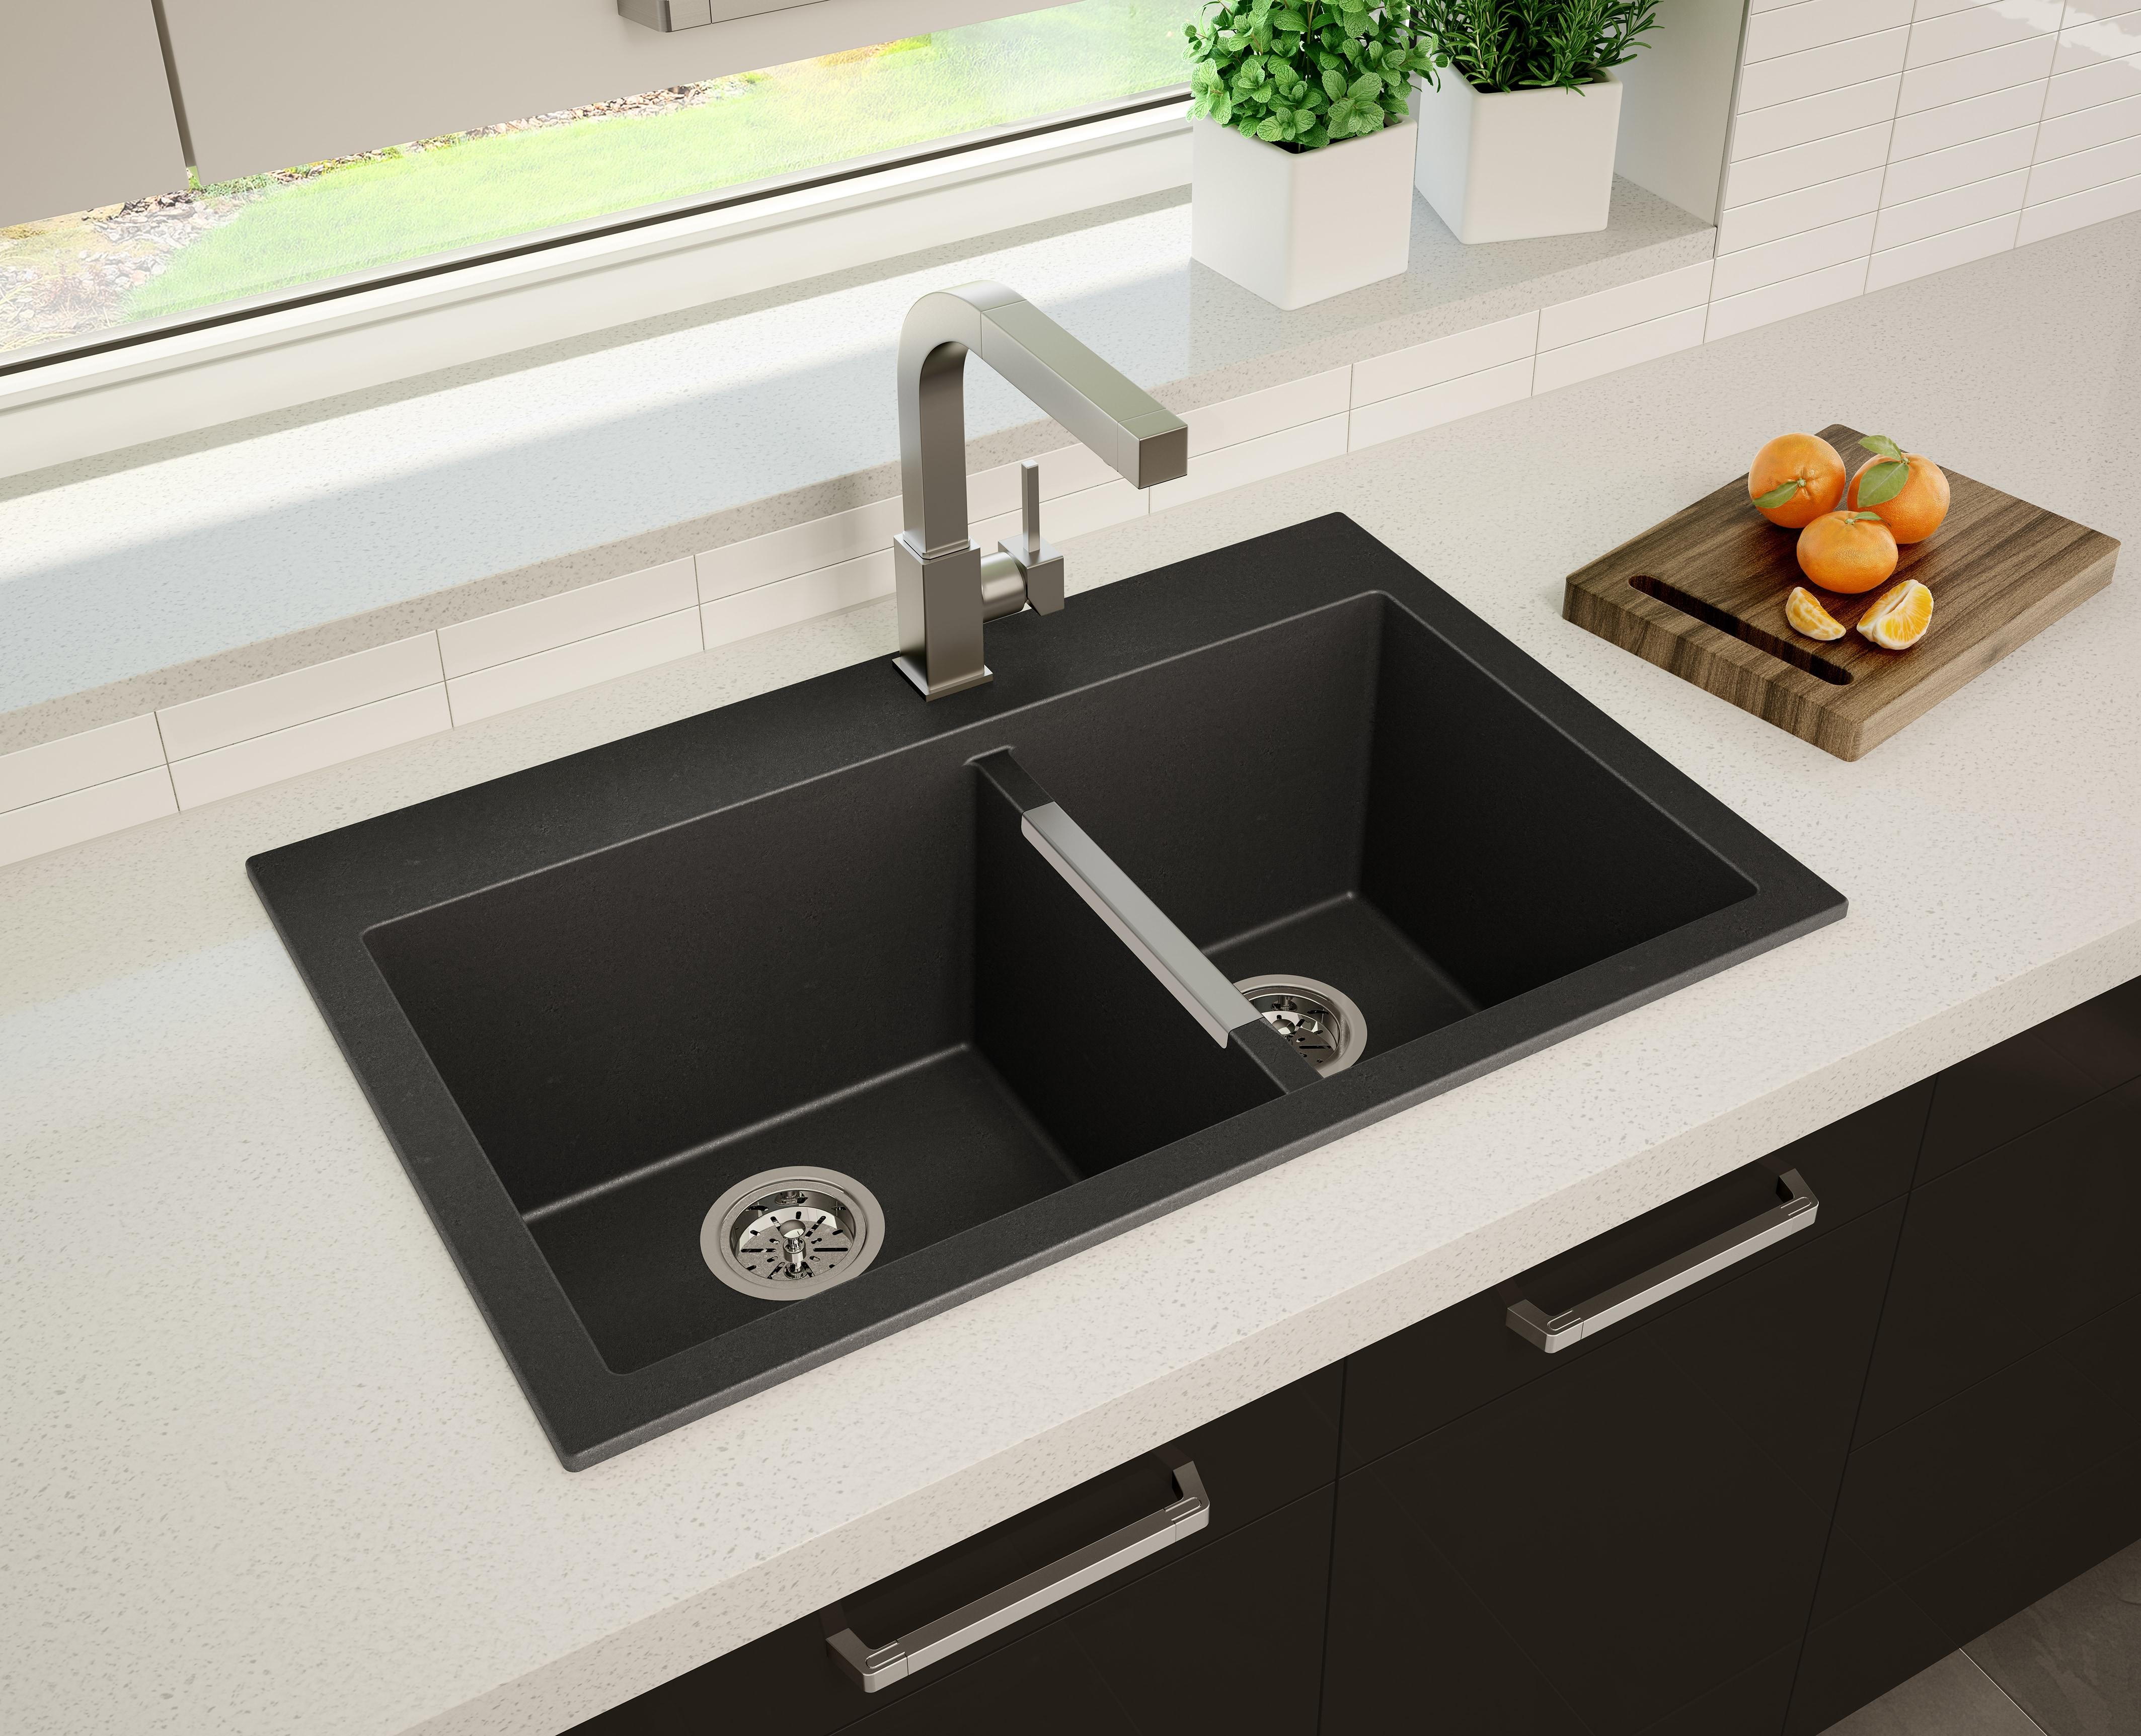 S wheatland 60 40 kitchen sink black granite undermount - Best caulk for undermount kitchen sink ...